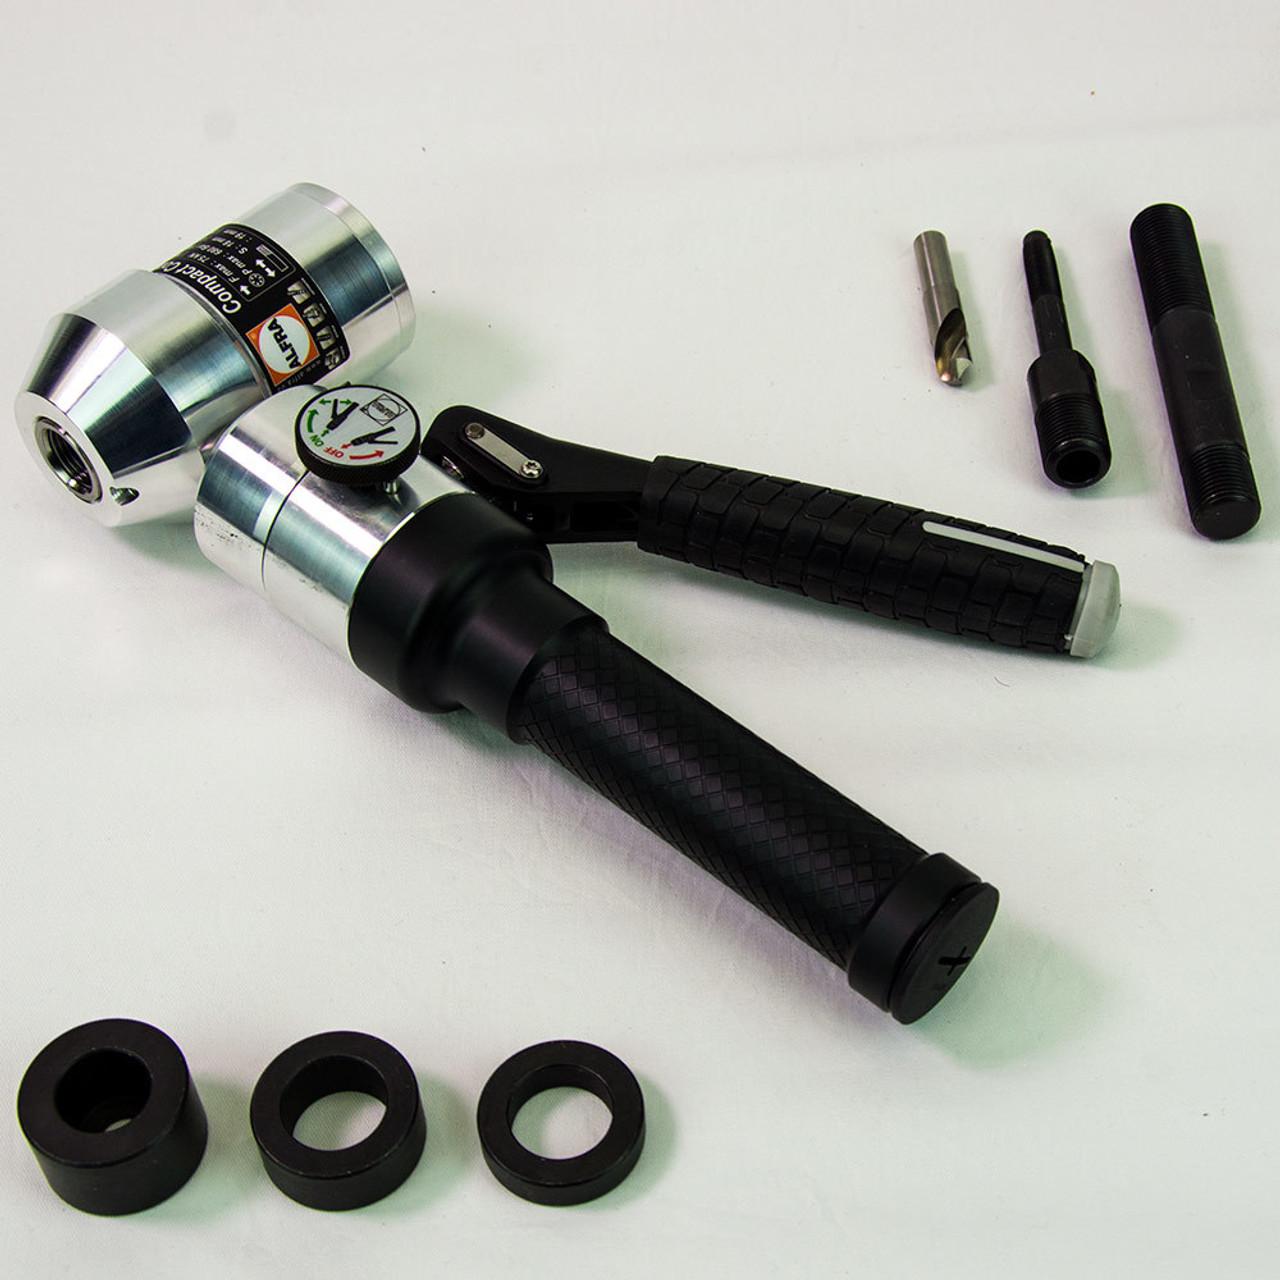 Alfra CompactCombi Manual 90 Degree Punching Tool Kit